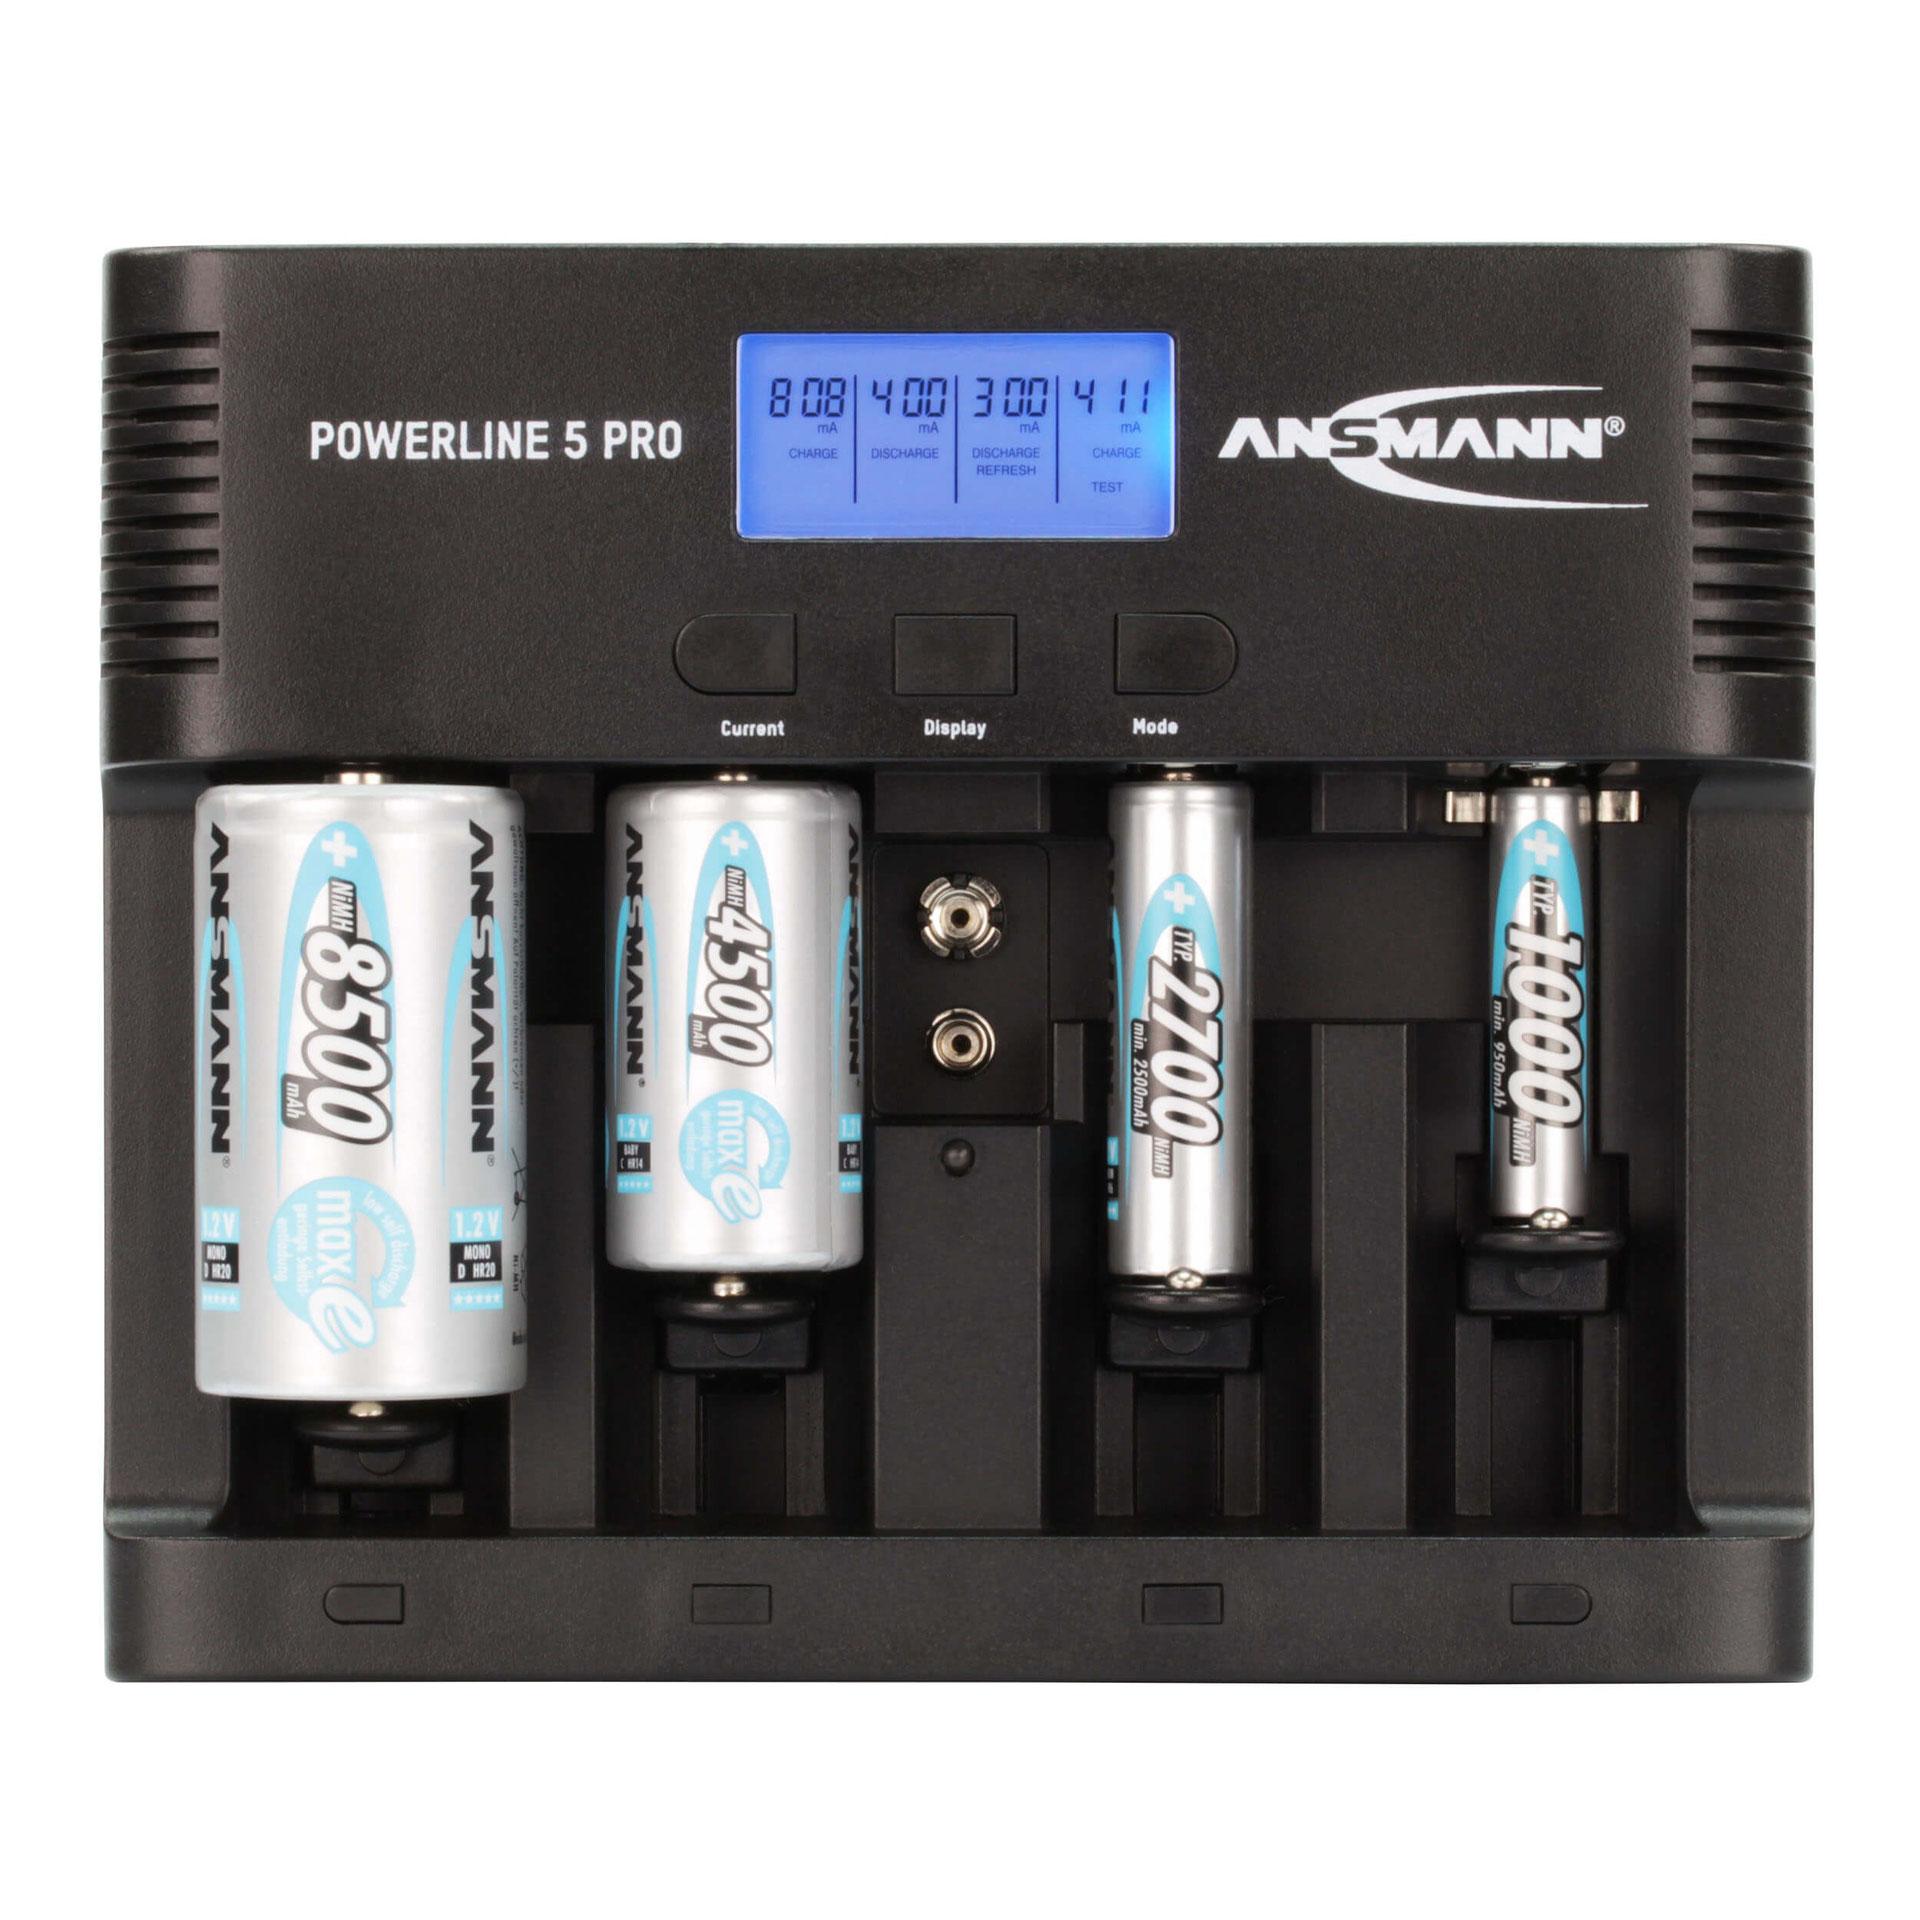 Ansmann Powerline 5 Pro